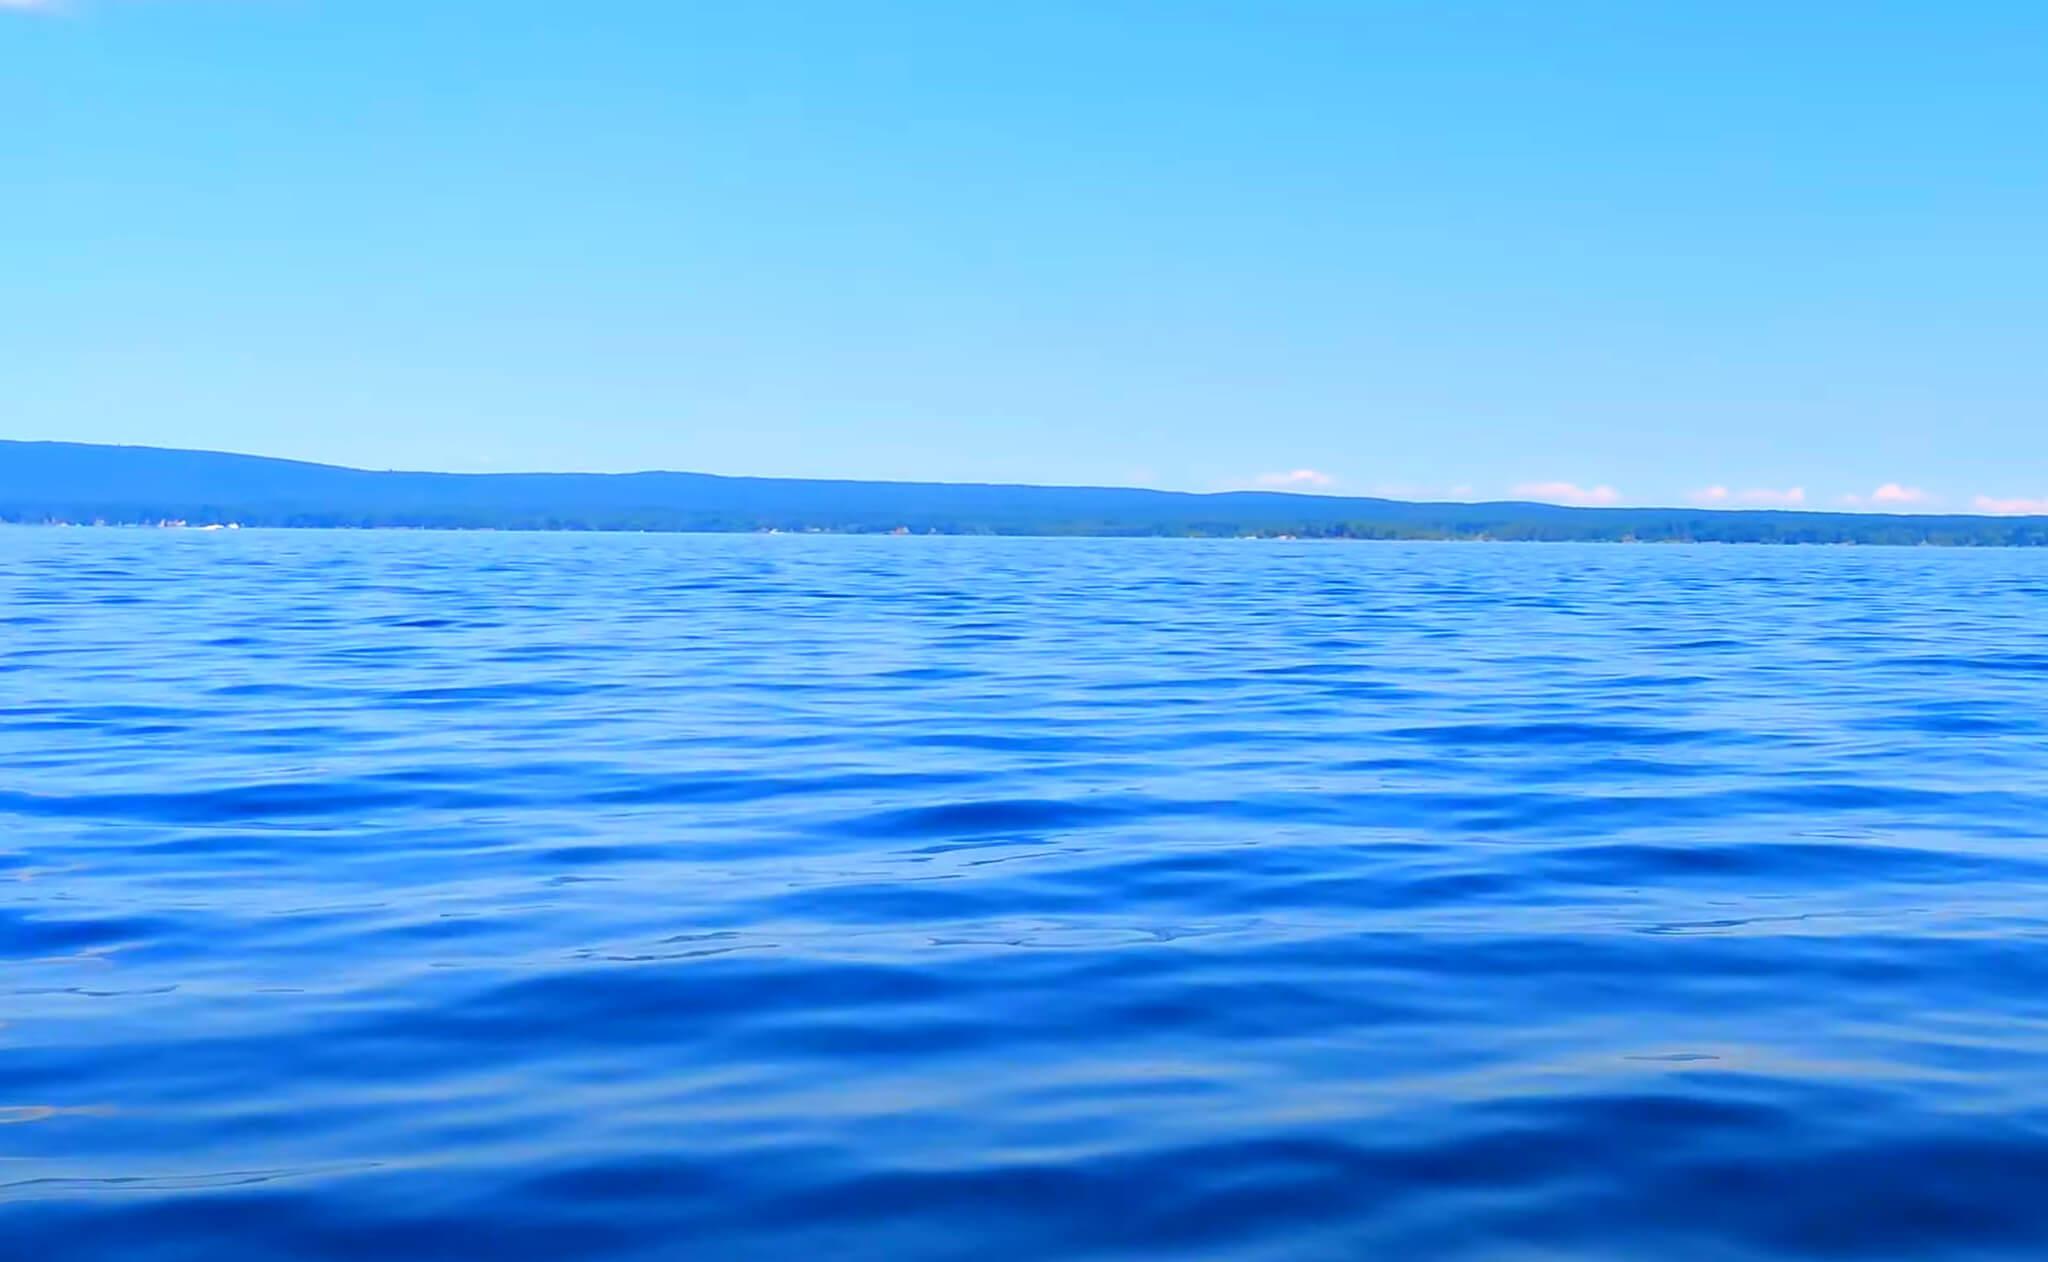 Great-Sacandaga-Lake-Fishing-Report-Guide-New-York-NY-02